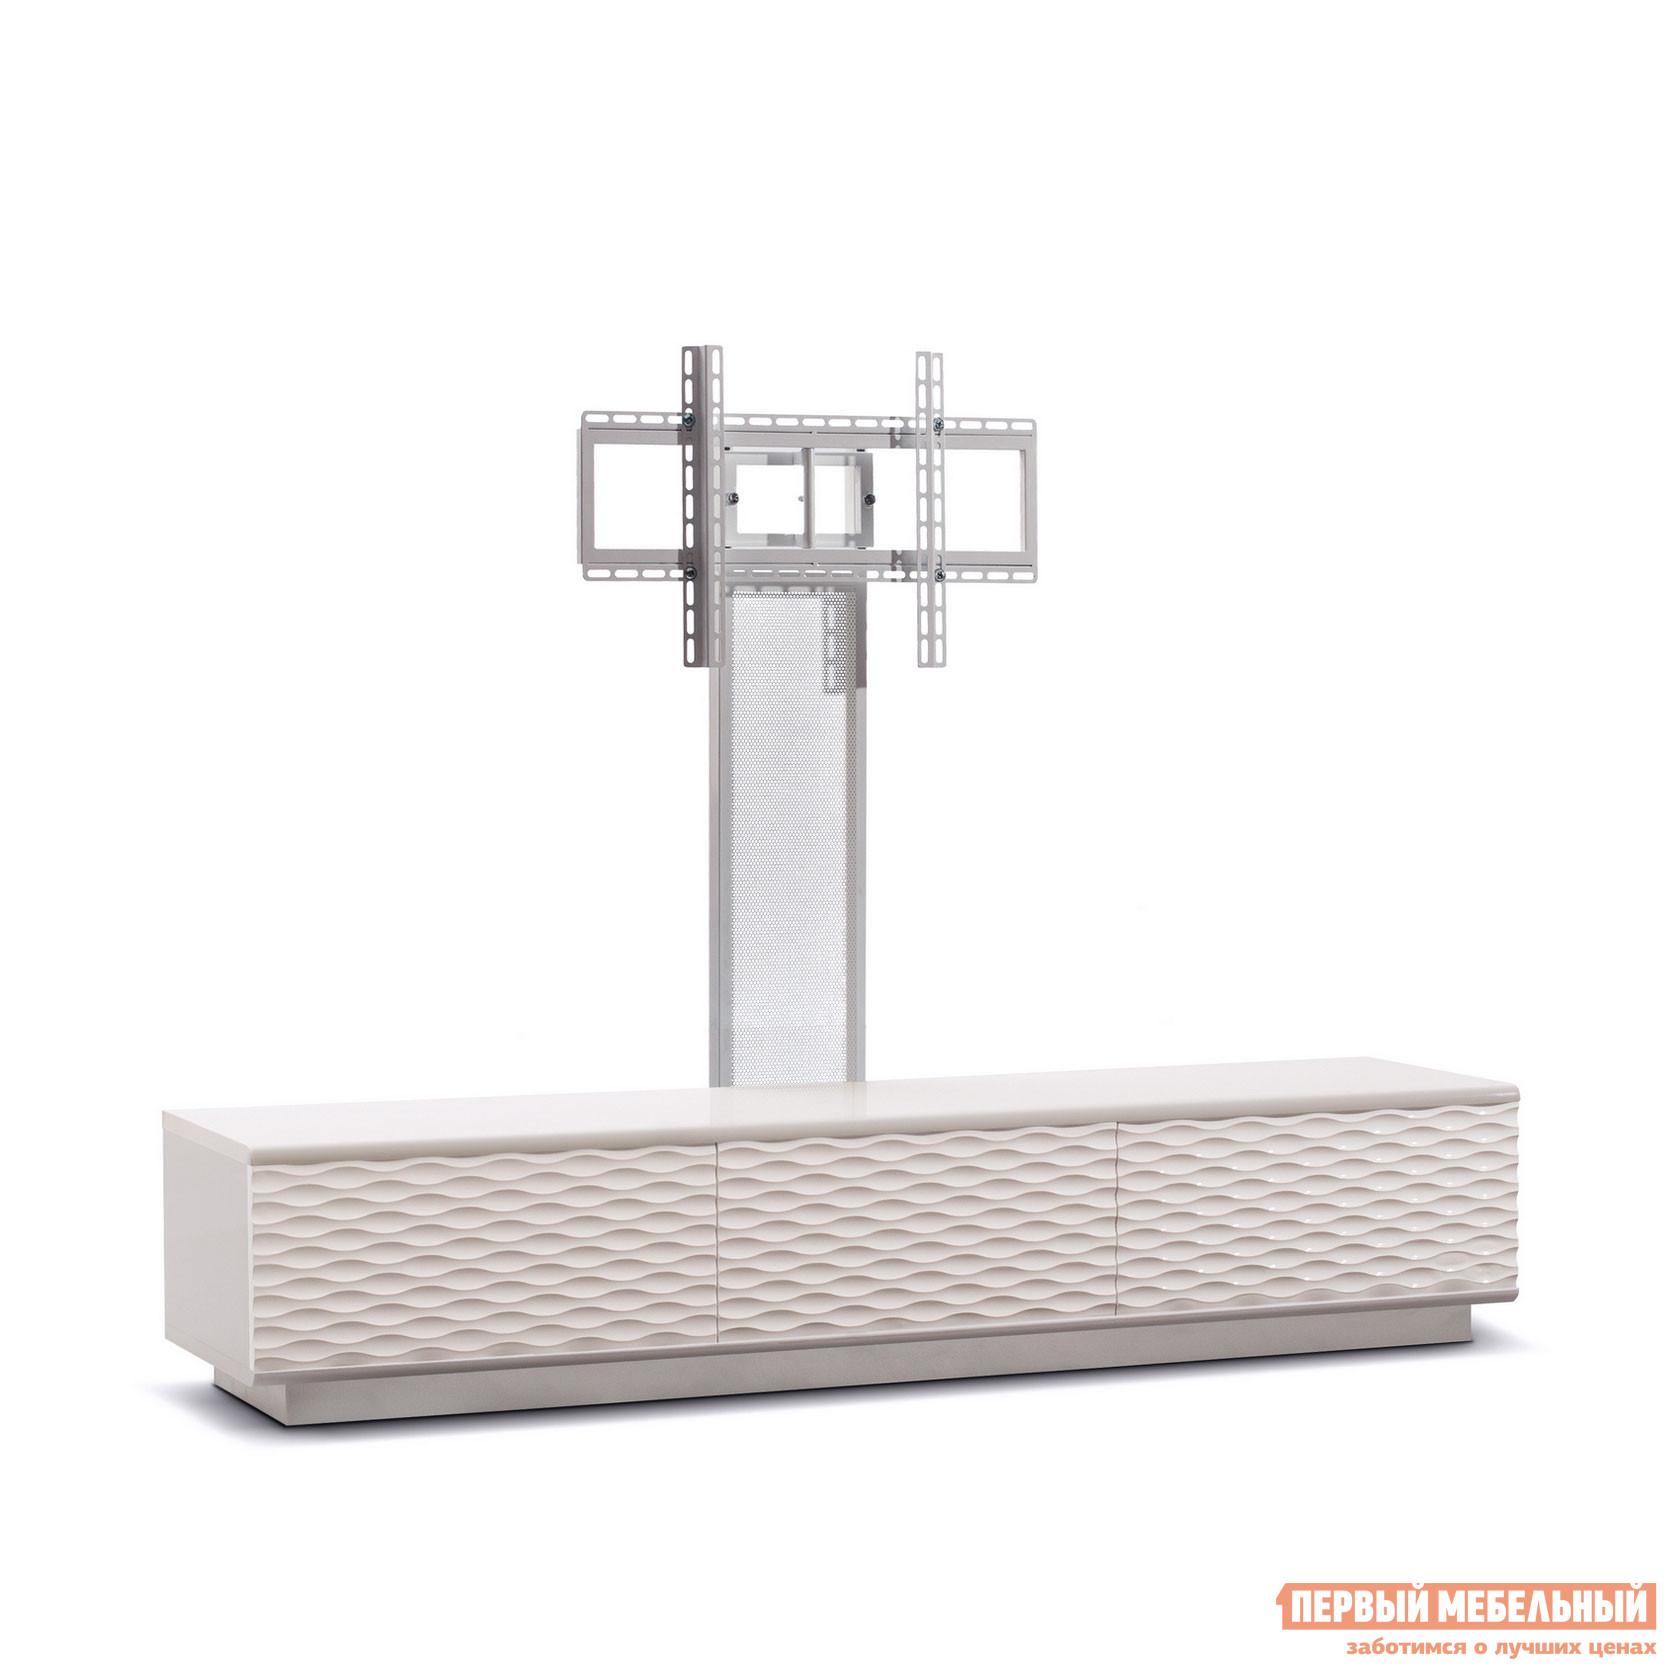 цена на ТВ-тумба Akur Design Studio Lisewood Luna 3 PS с креплением для ТВ